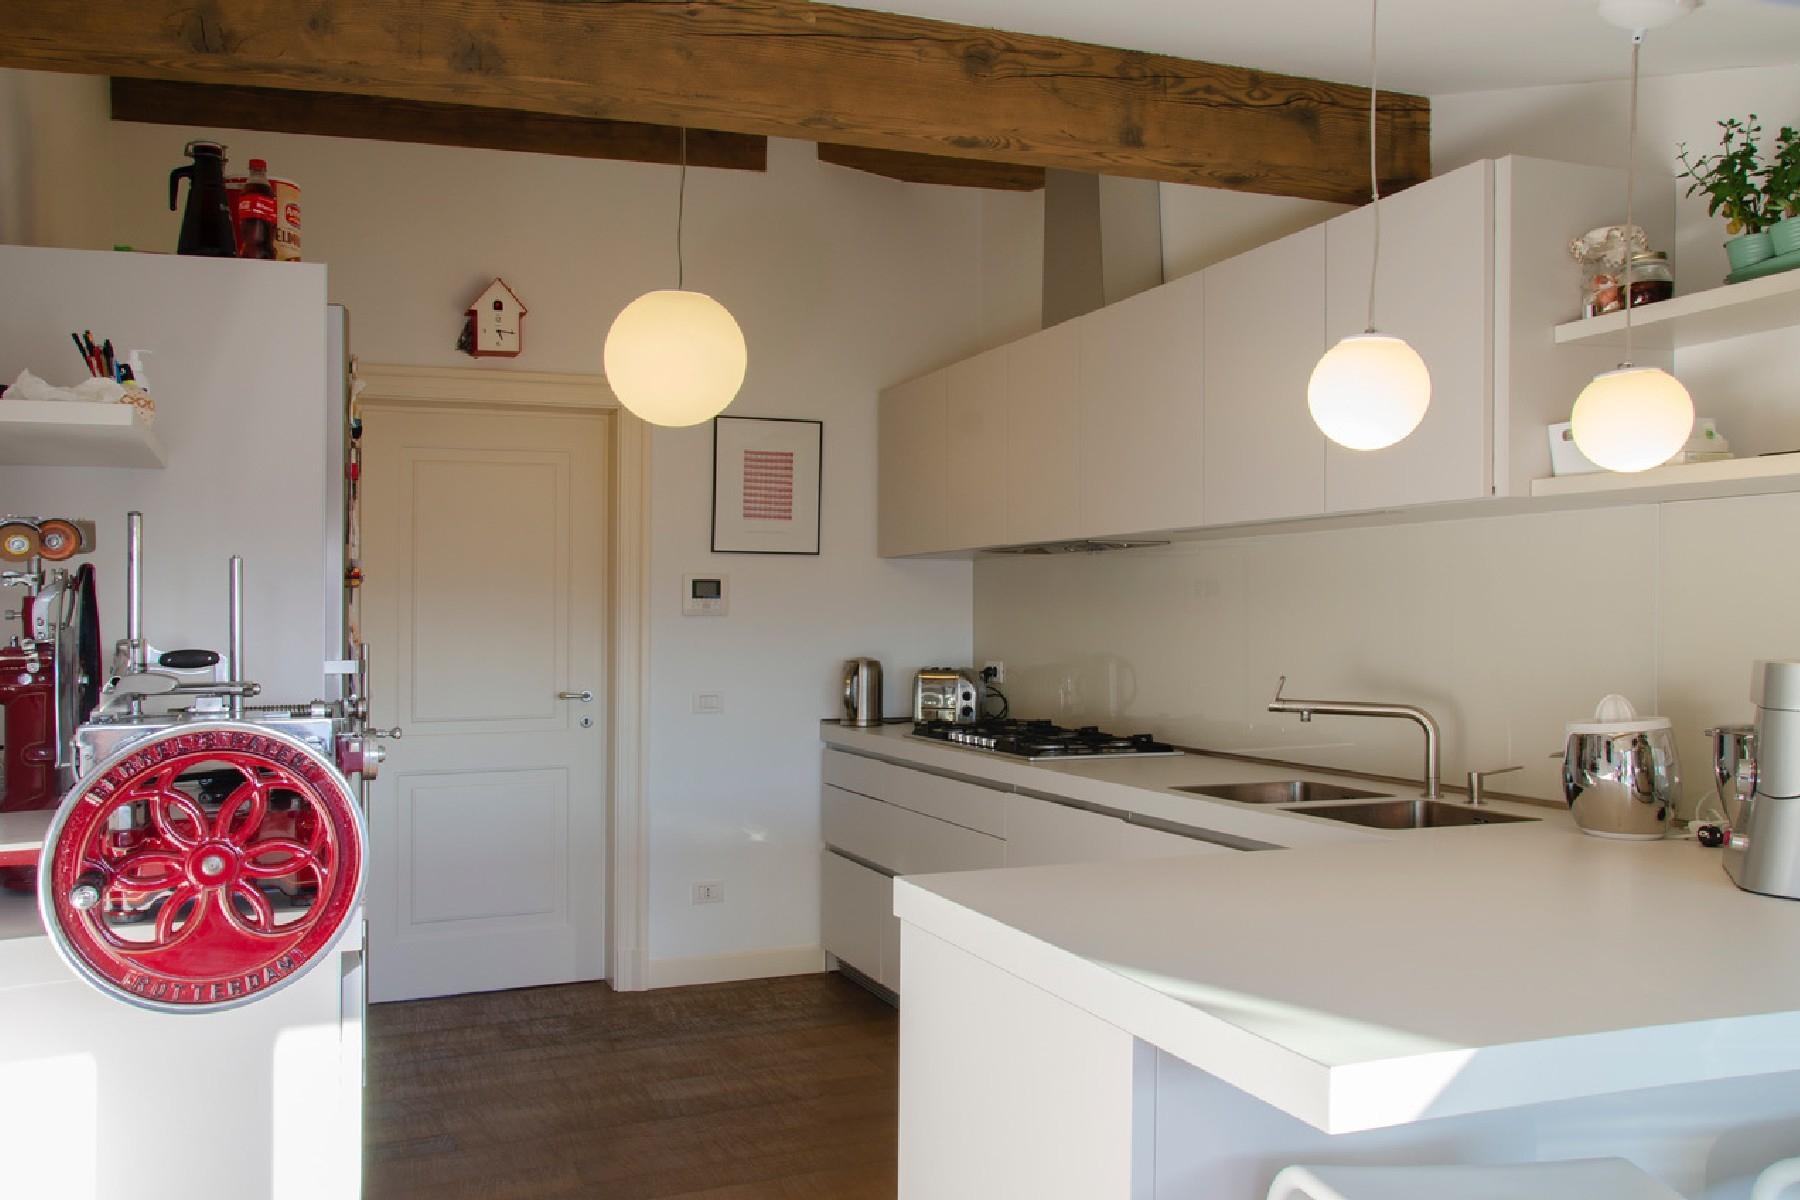 Appartamento in Vendita a Merate: 4 locali, 225 mq - Foto 18